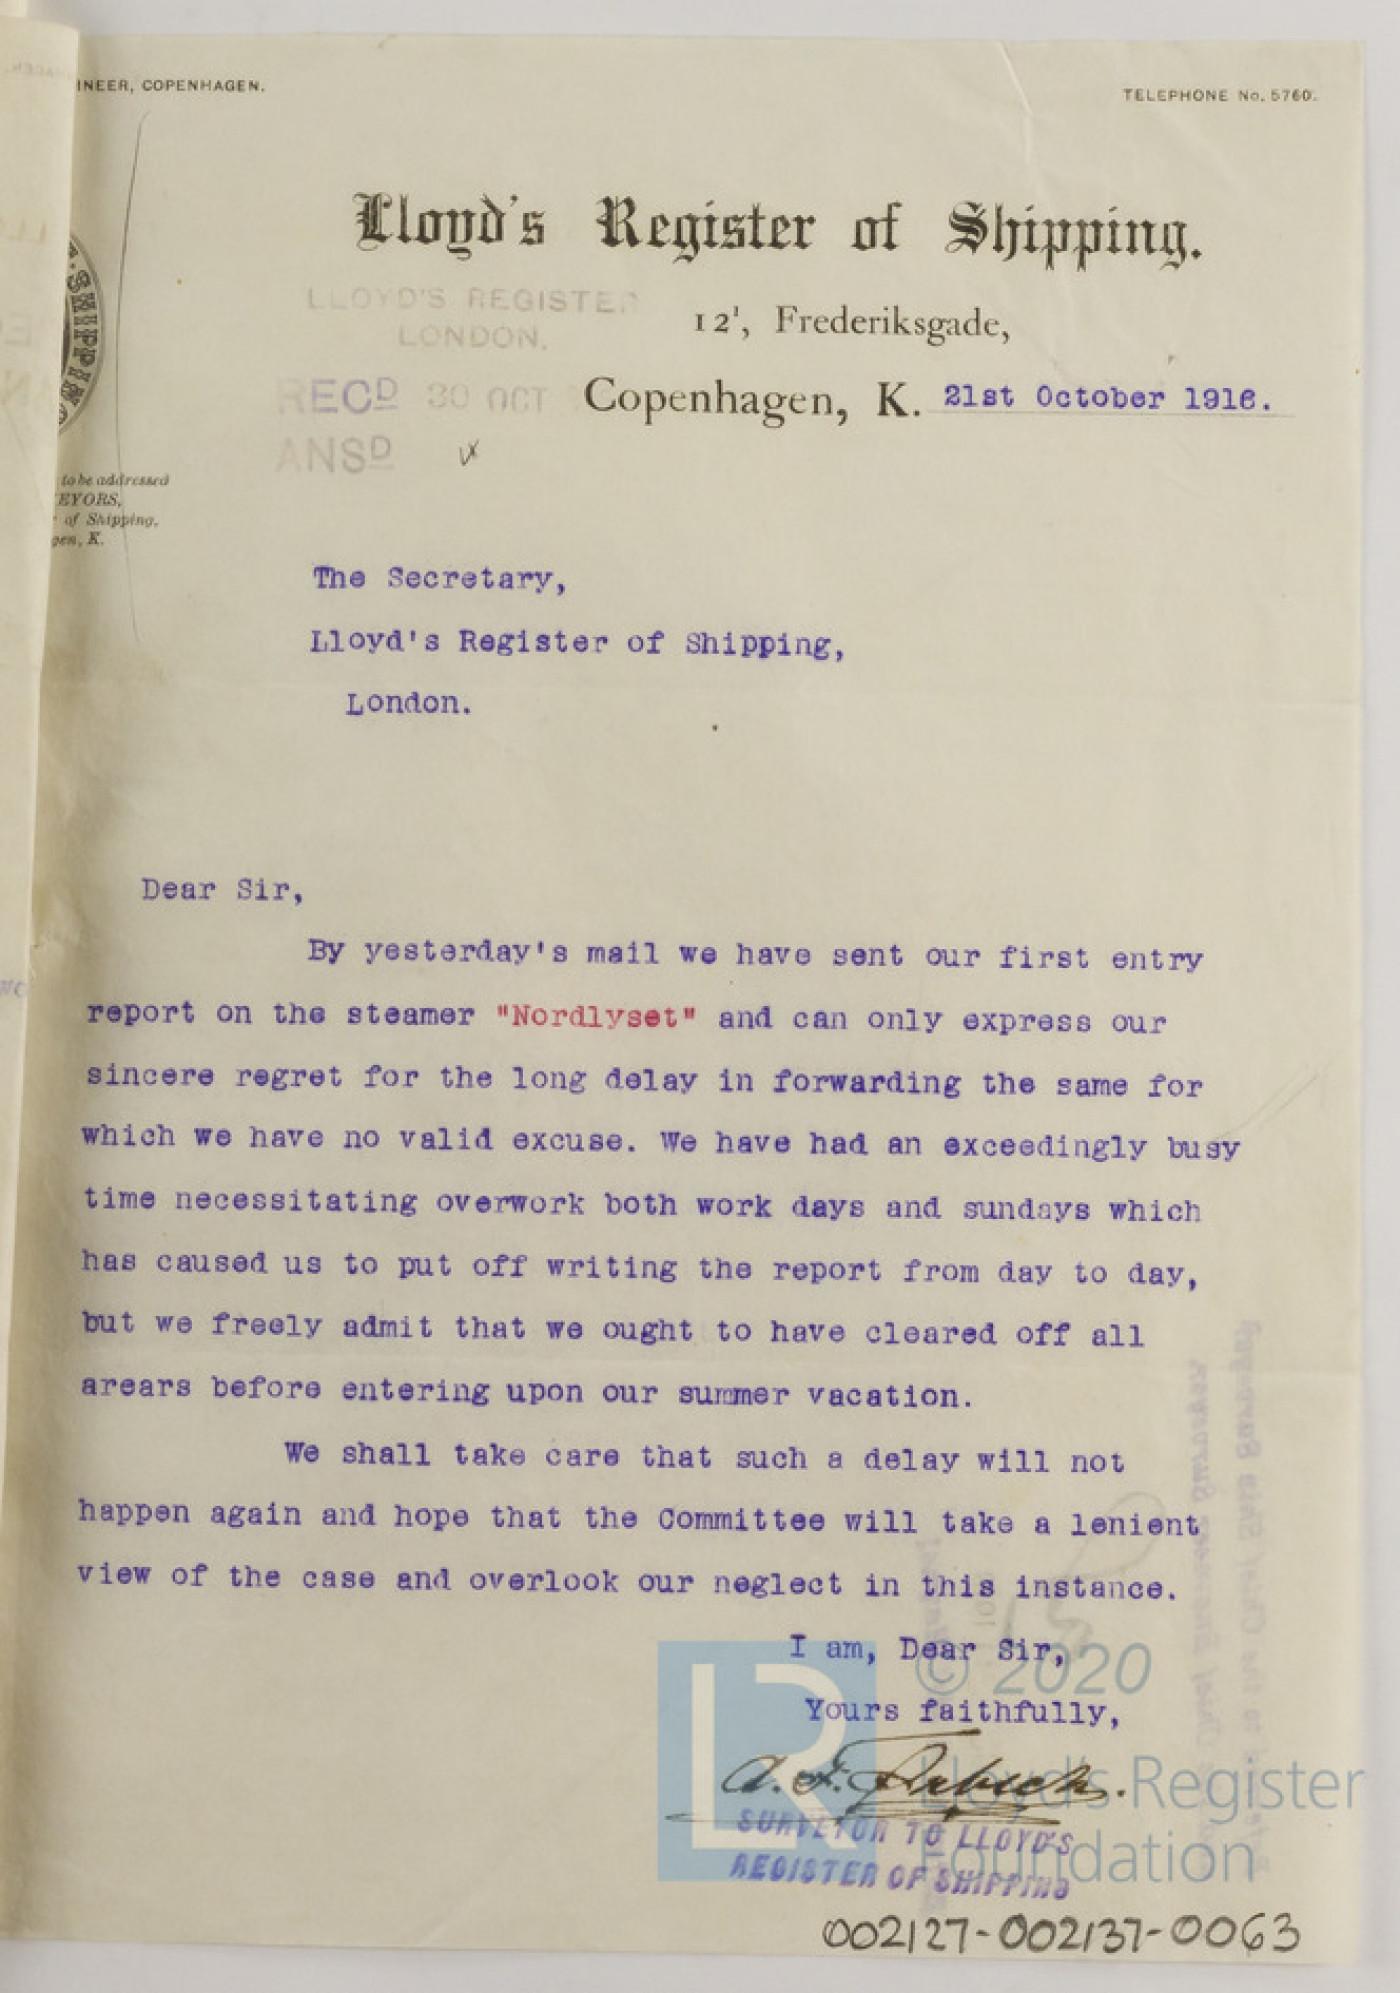 Letter from A F Orbech, Copenhagen Surveyor, to the Secretary for Lloyd's Register regarding Nordlyset, 21st October 1916